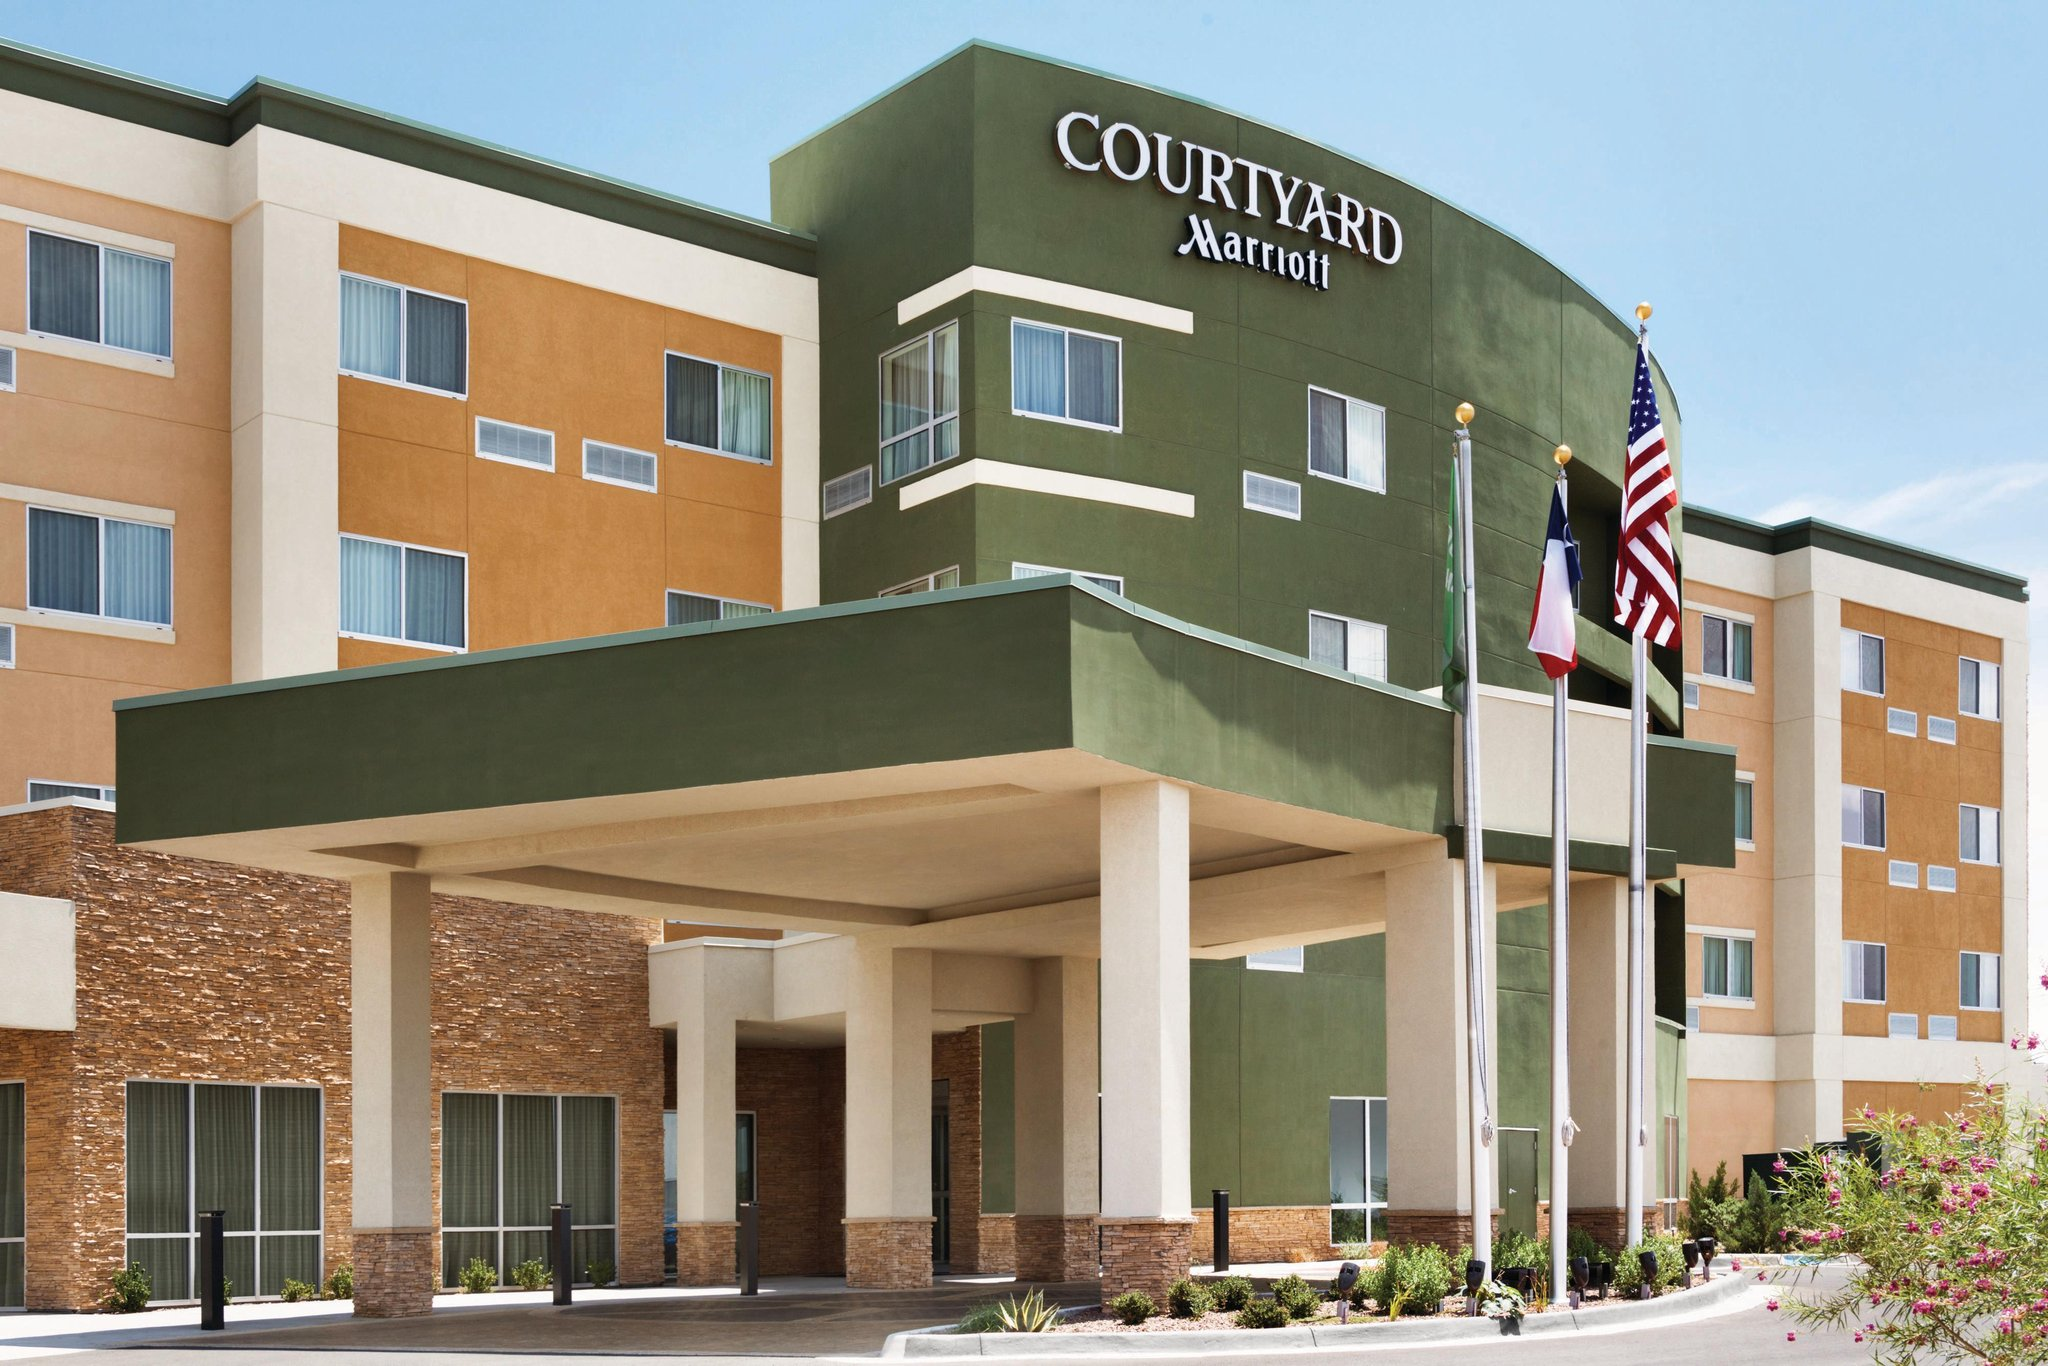 Courtyard by Marriott El Paso East/I-10